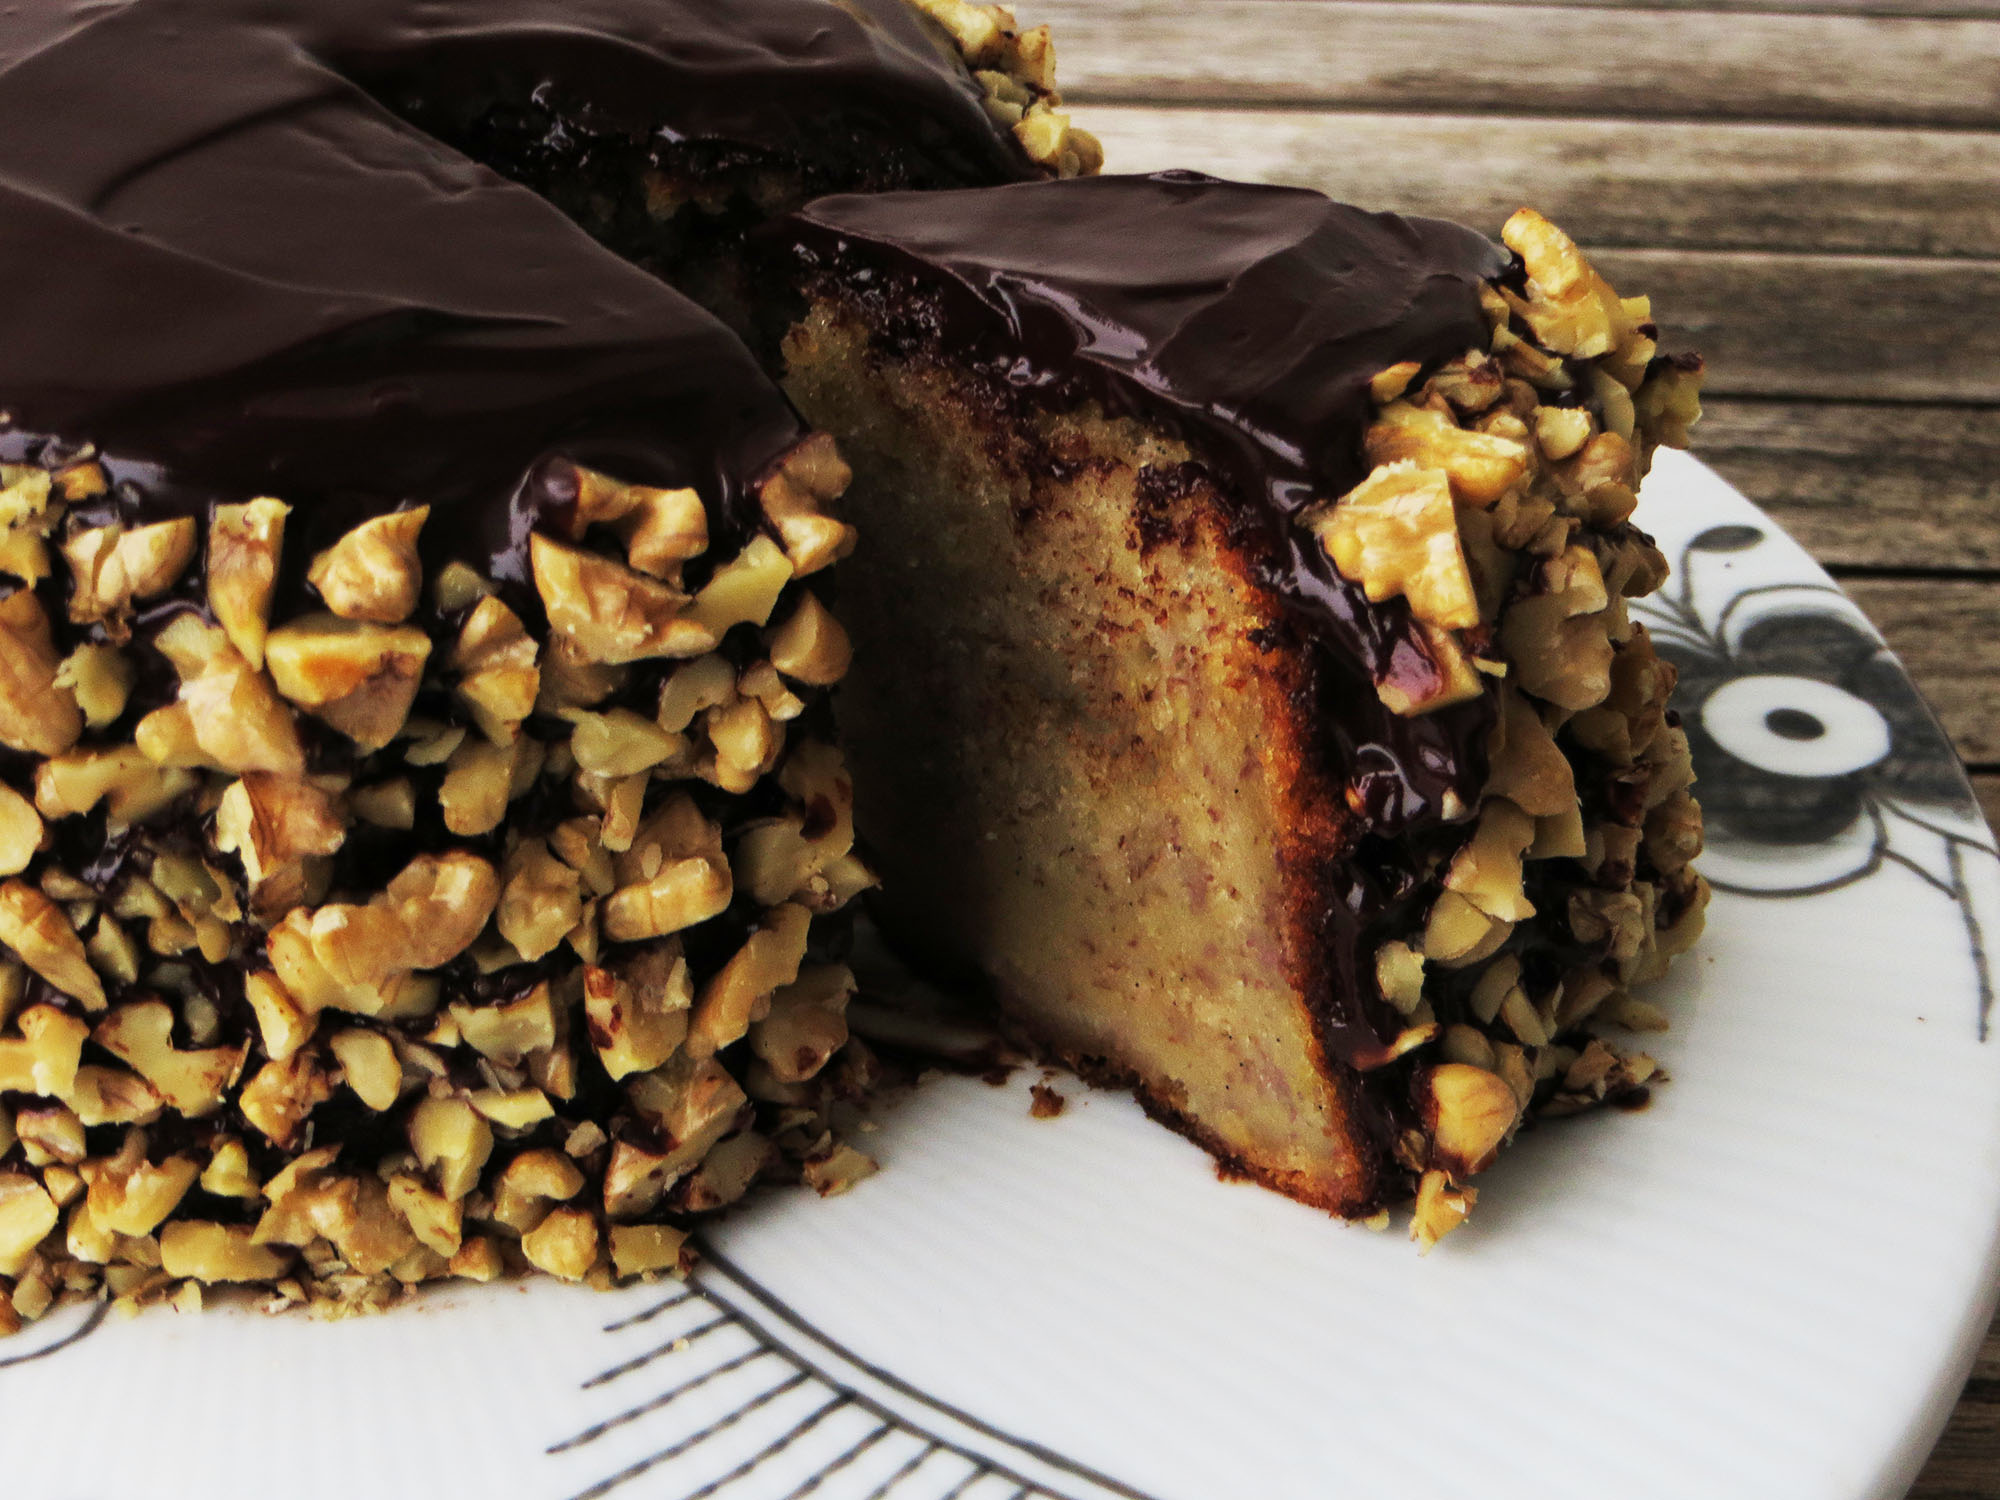 Tortë Me Arra Receta Kuzhine